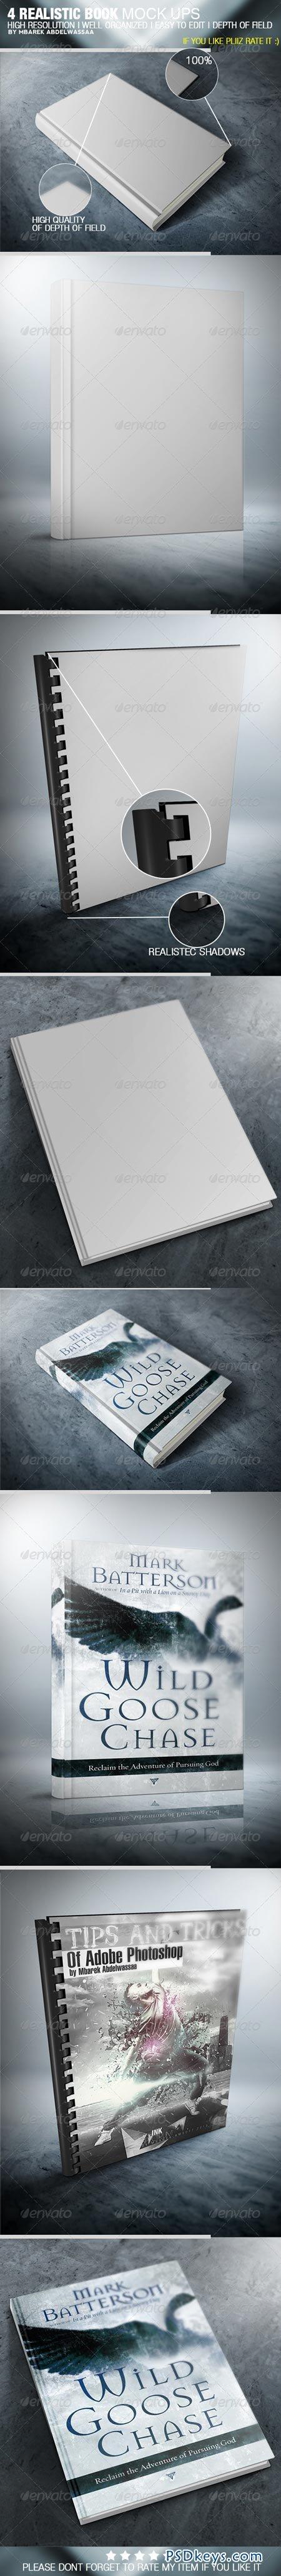 4 Realistic Book Cover Mock Ups 5254703